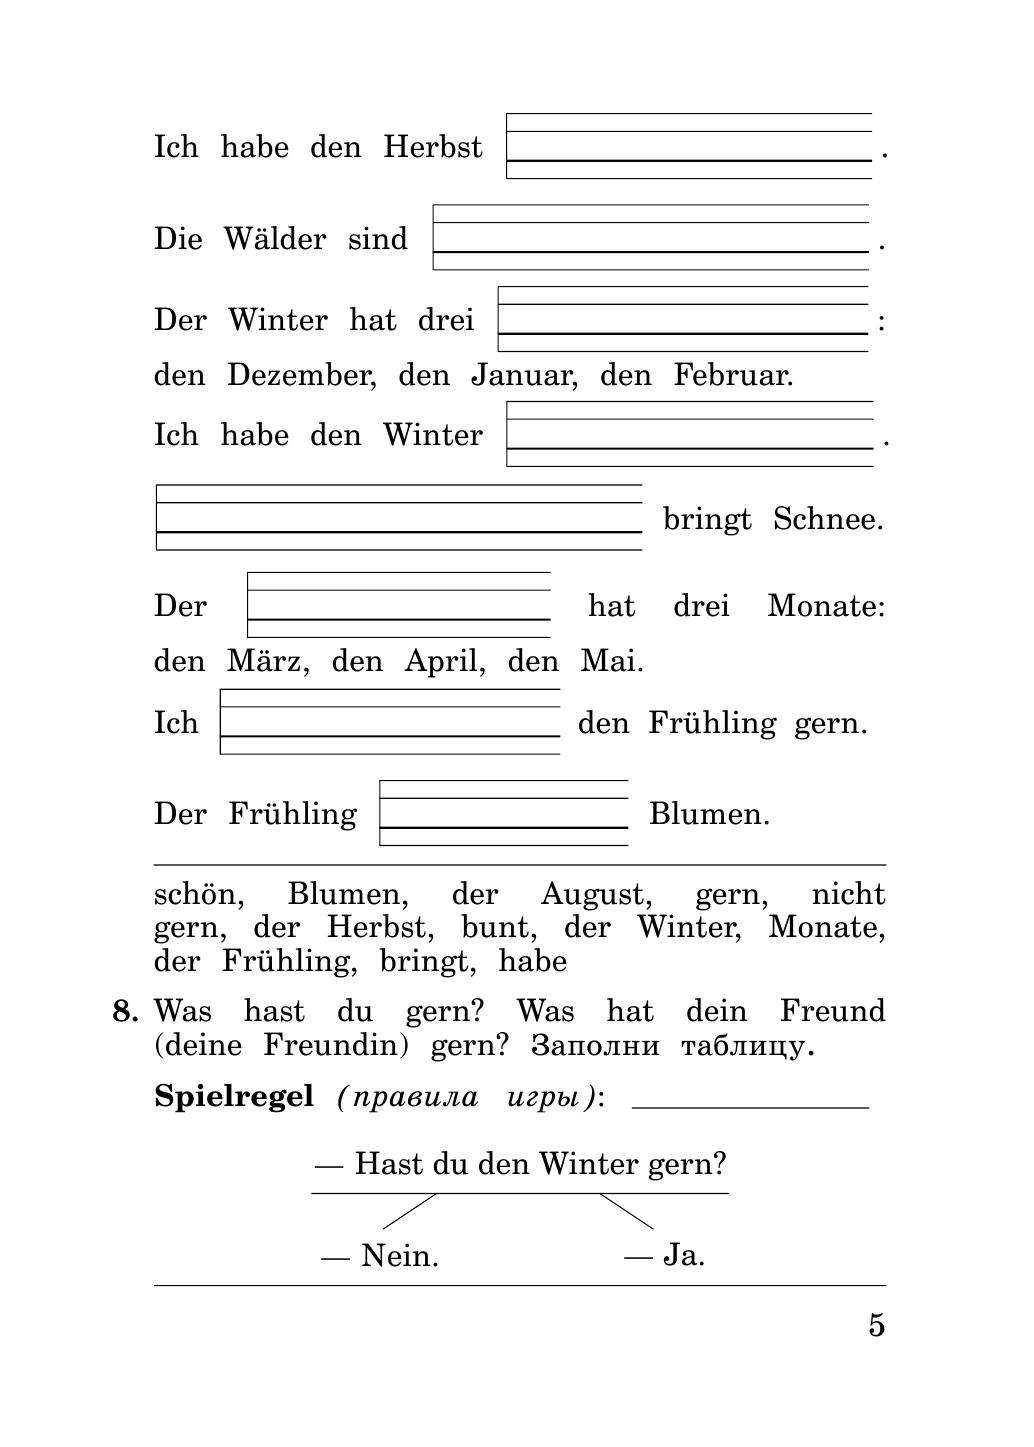 гдз немецкий язык рабочая тетрадь 3 класс гальскова гез рабочая тетрадь